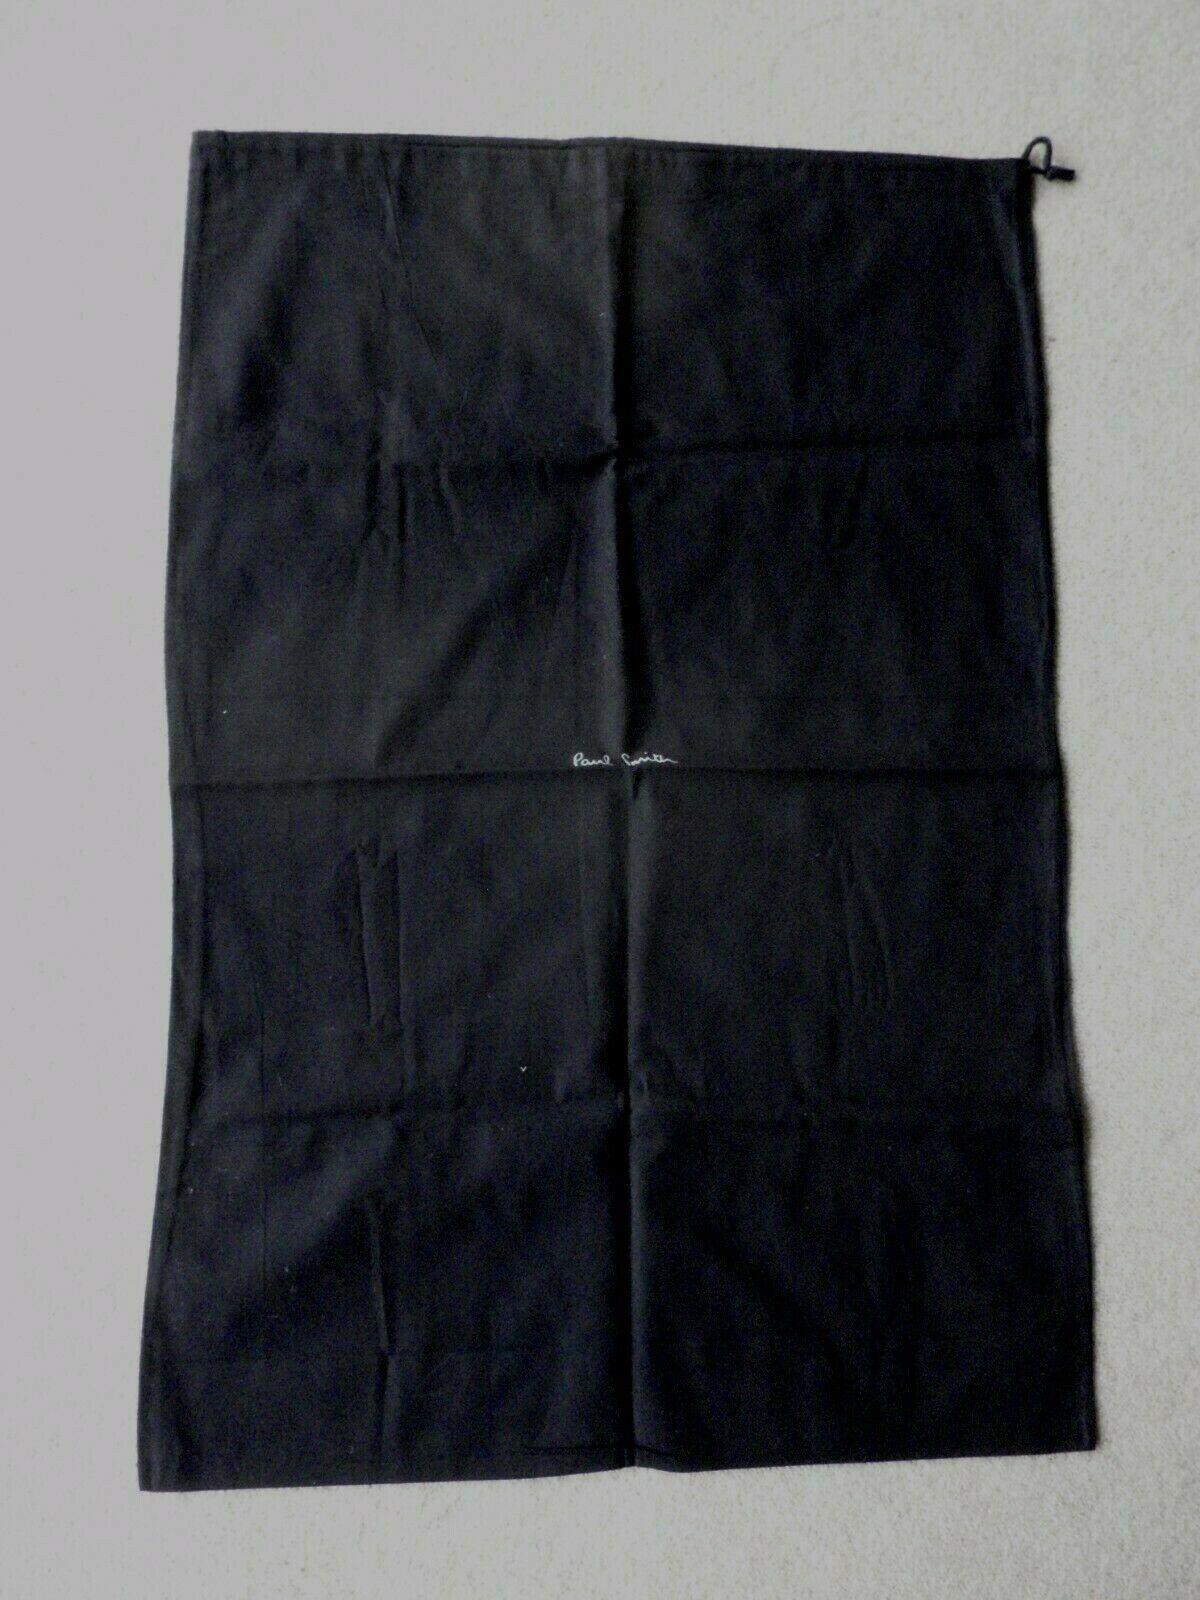 Paul Smith EXTRA Large Black Cotton Dustbag Sleeper Bag